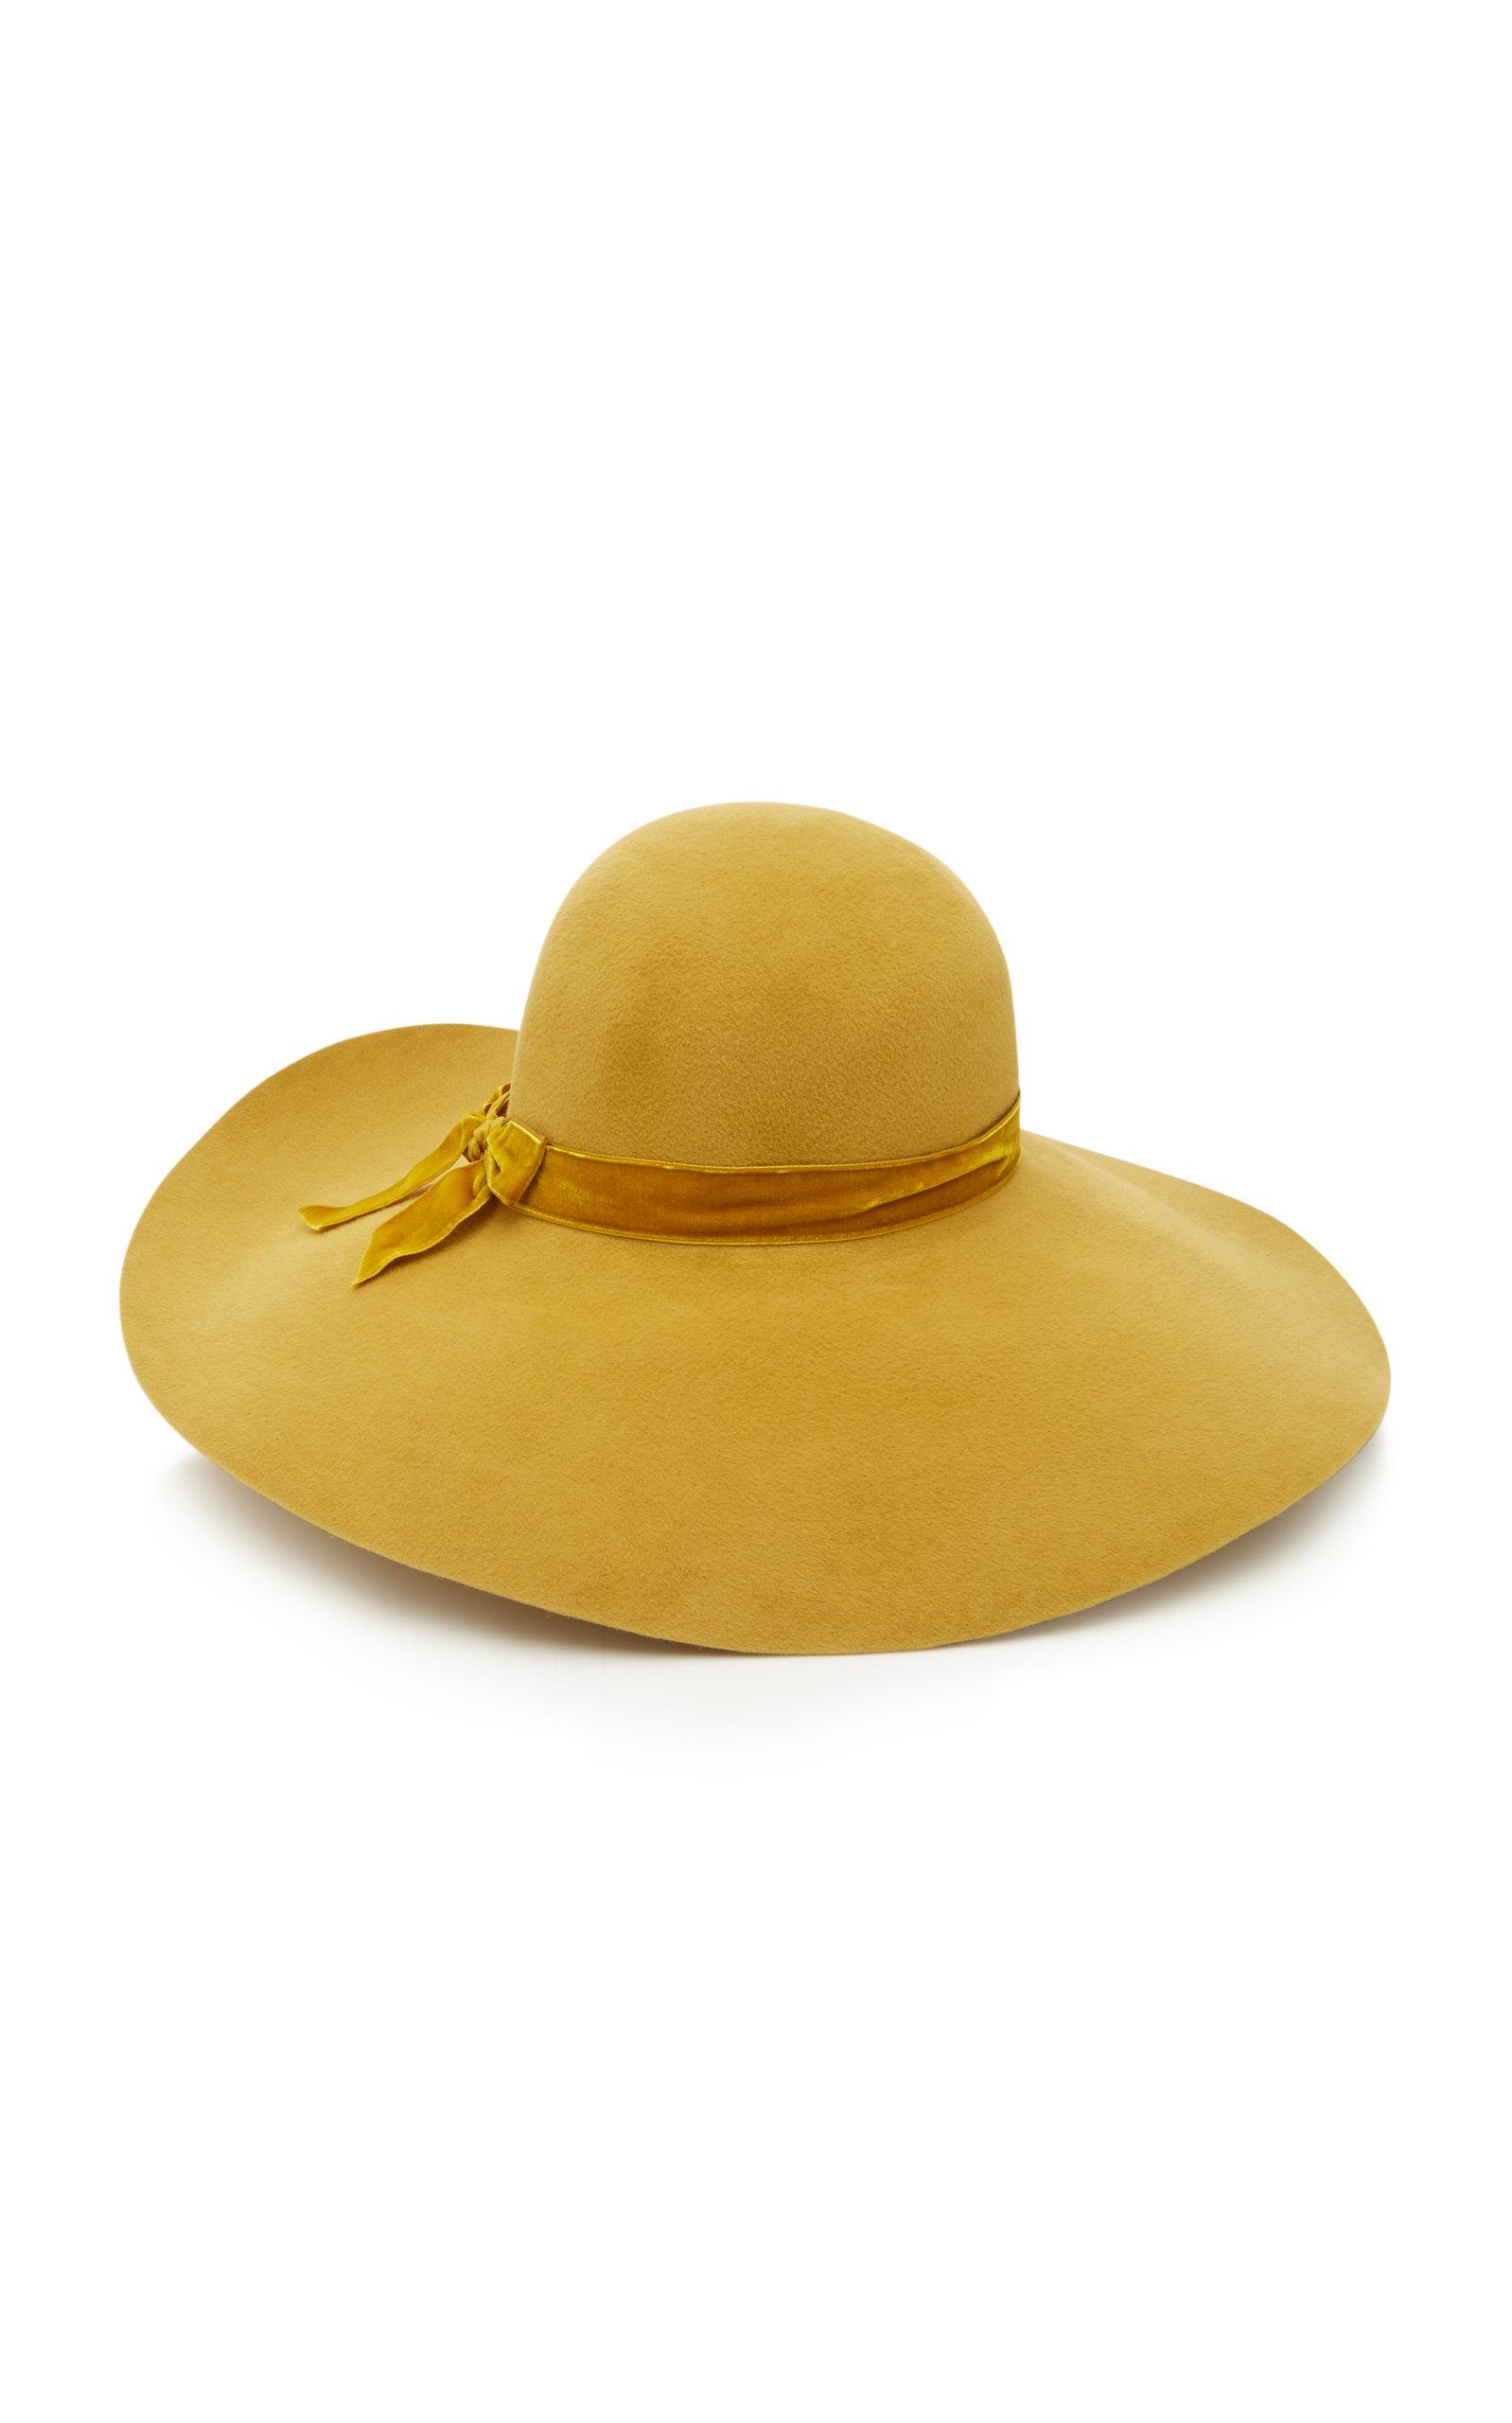 YESTADT MILLINERY Goldy Wide-Brim Felt Hat